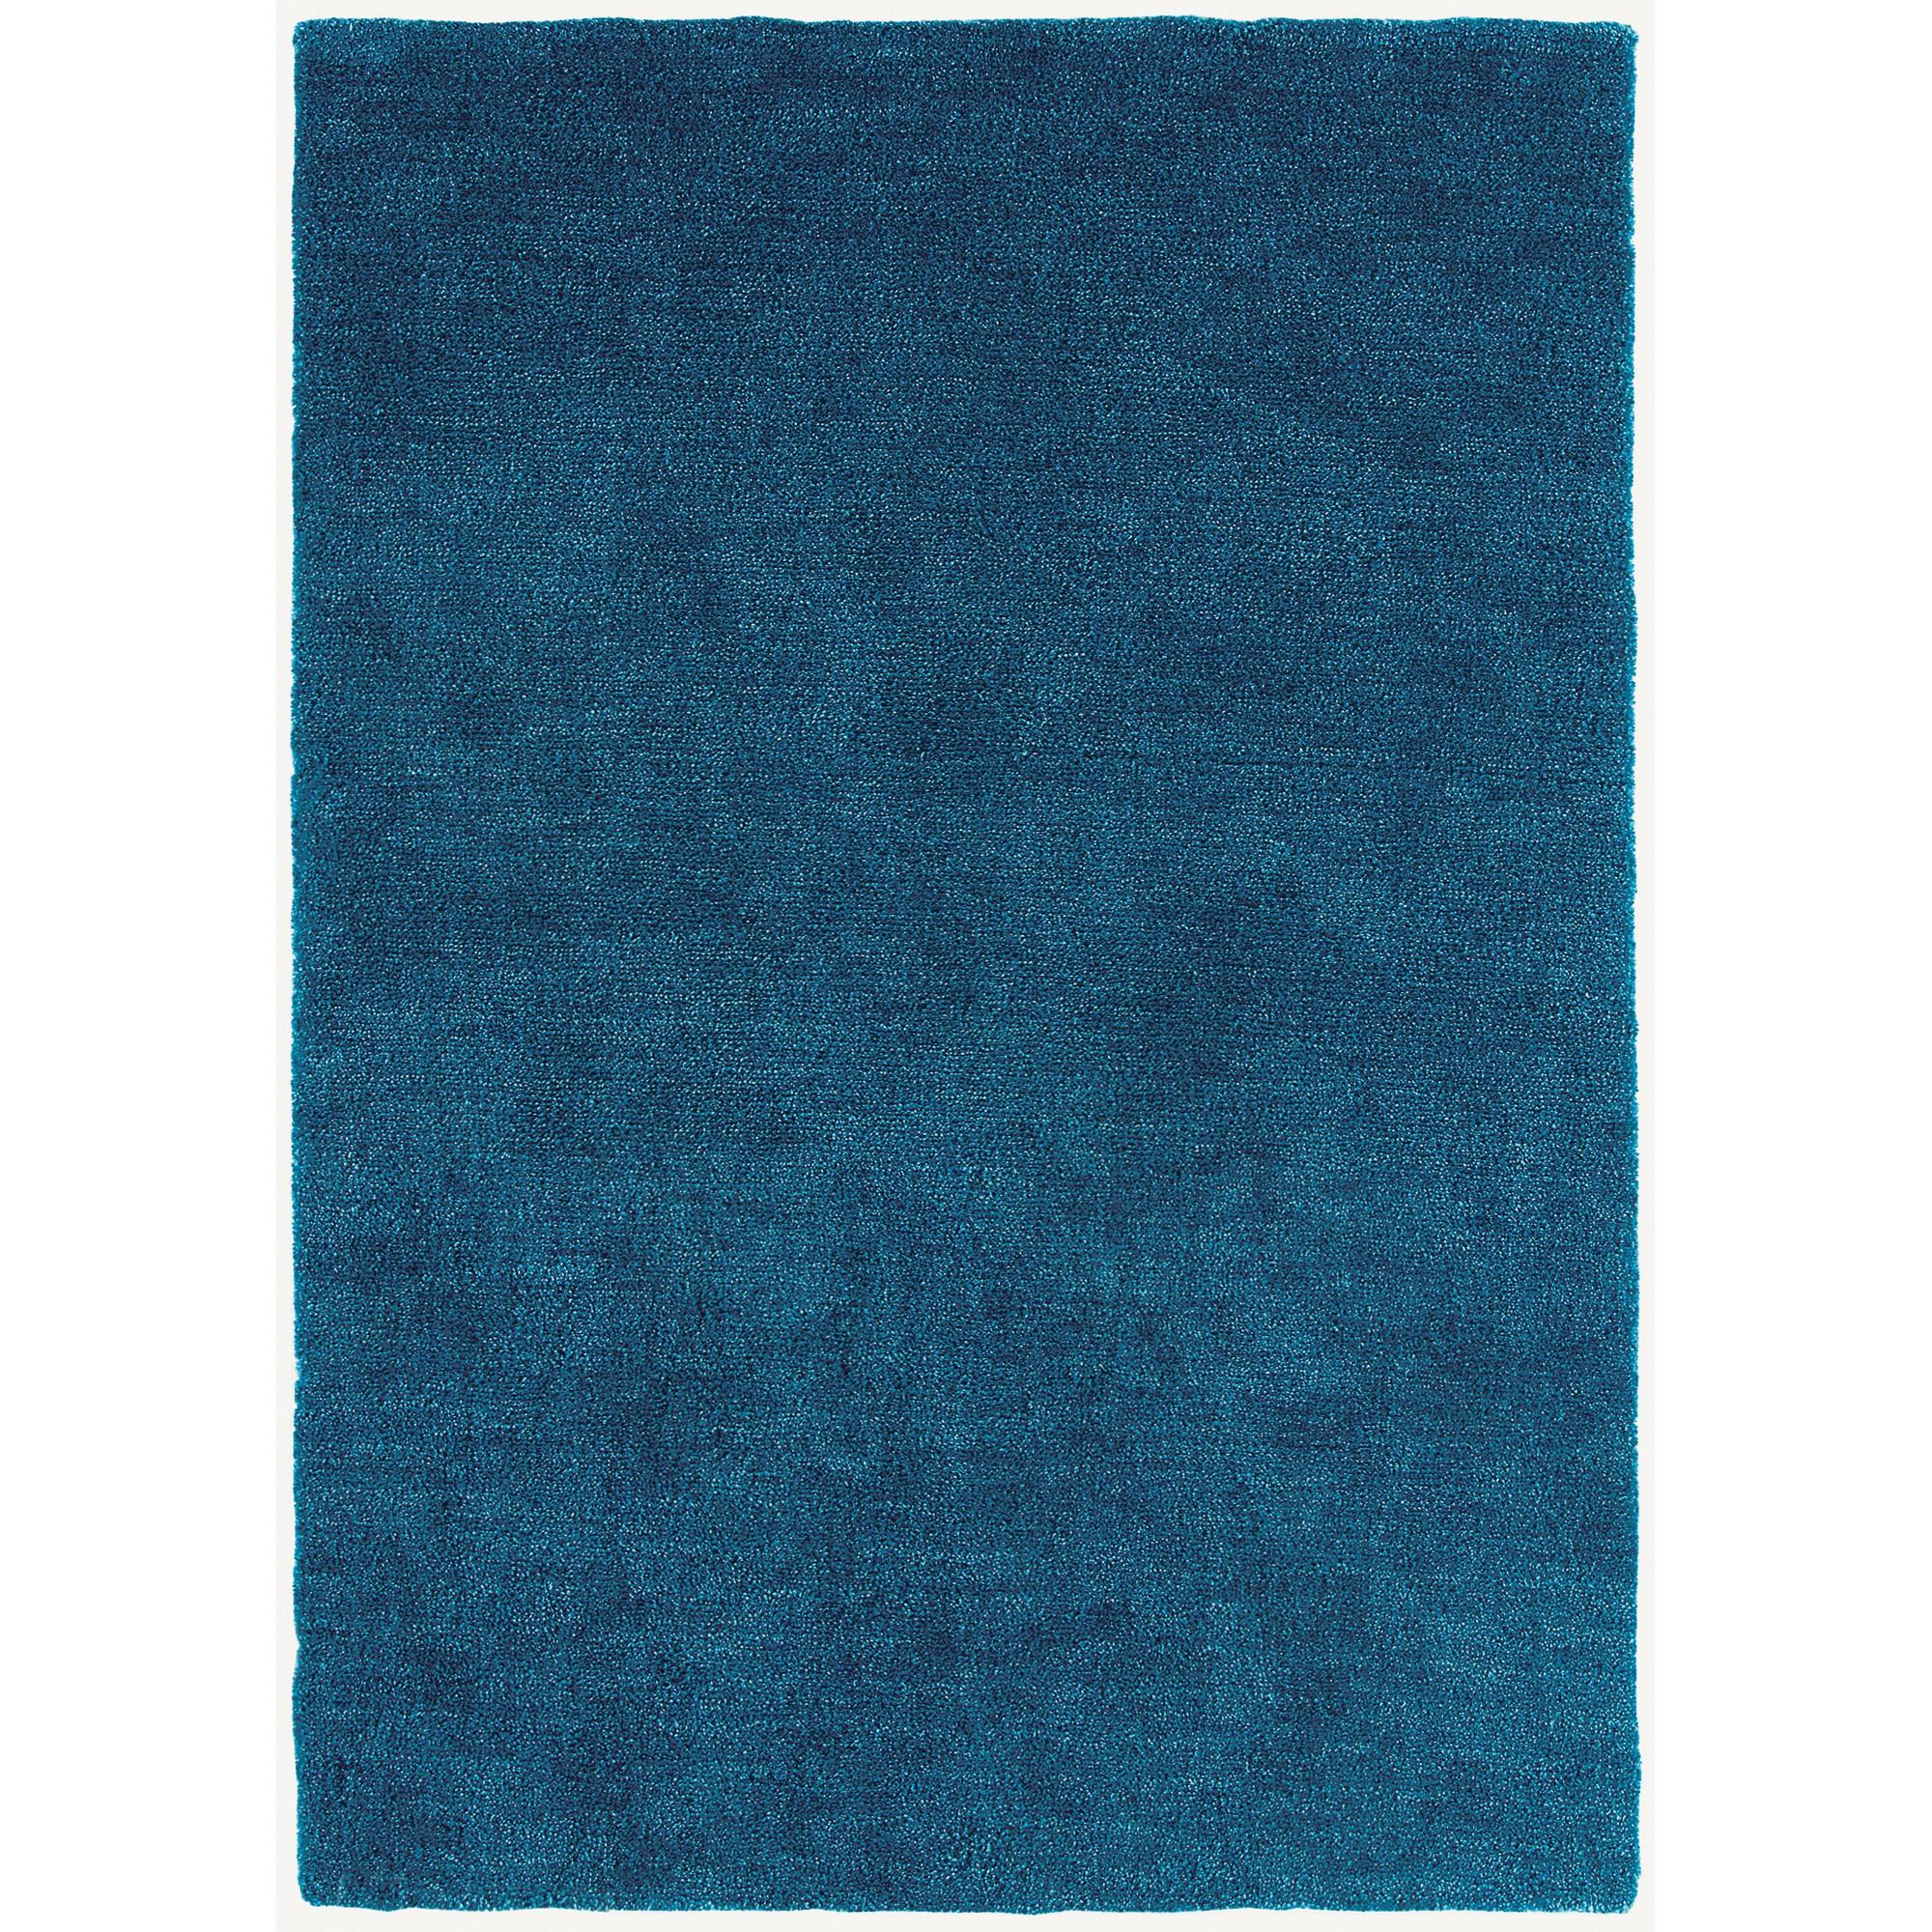 tula plain rugs in dark teal free uk delivery the rug seller. Black Bedroom Furniture Sets. Home Design Ideas